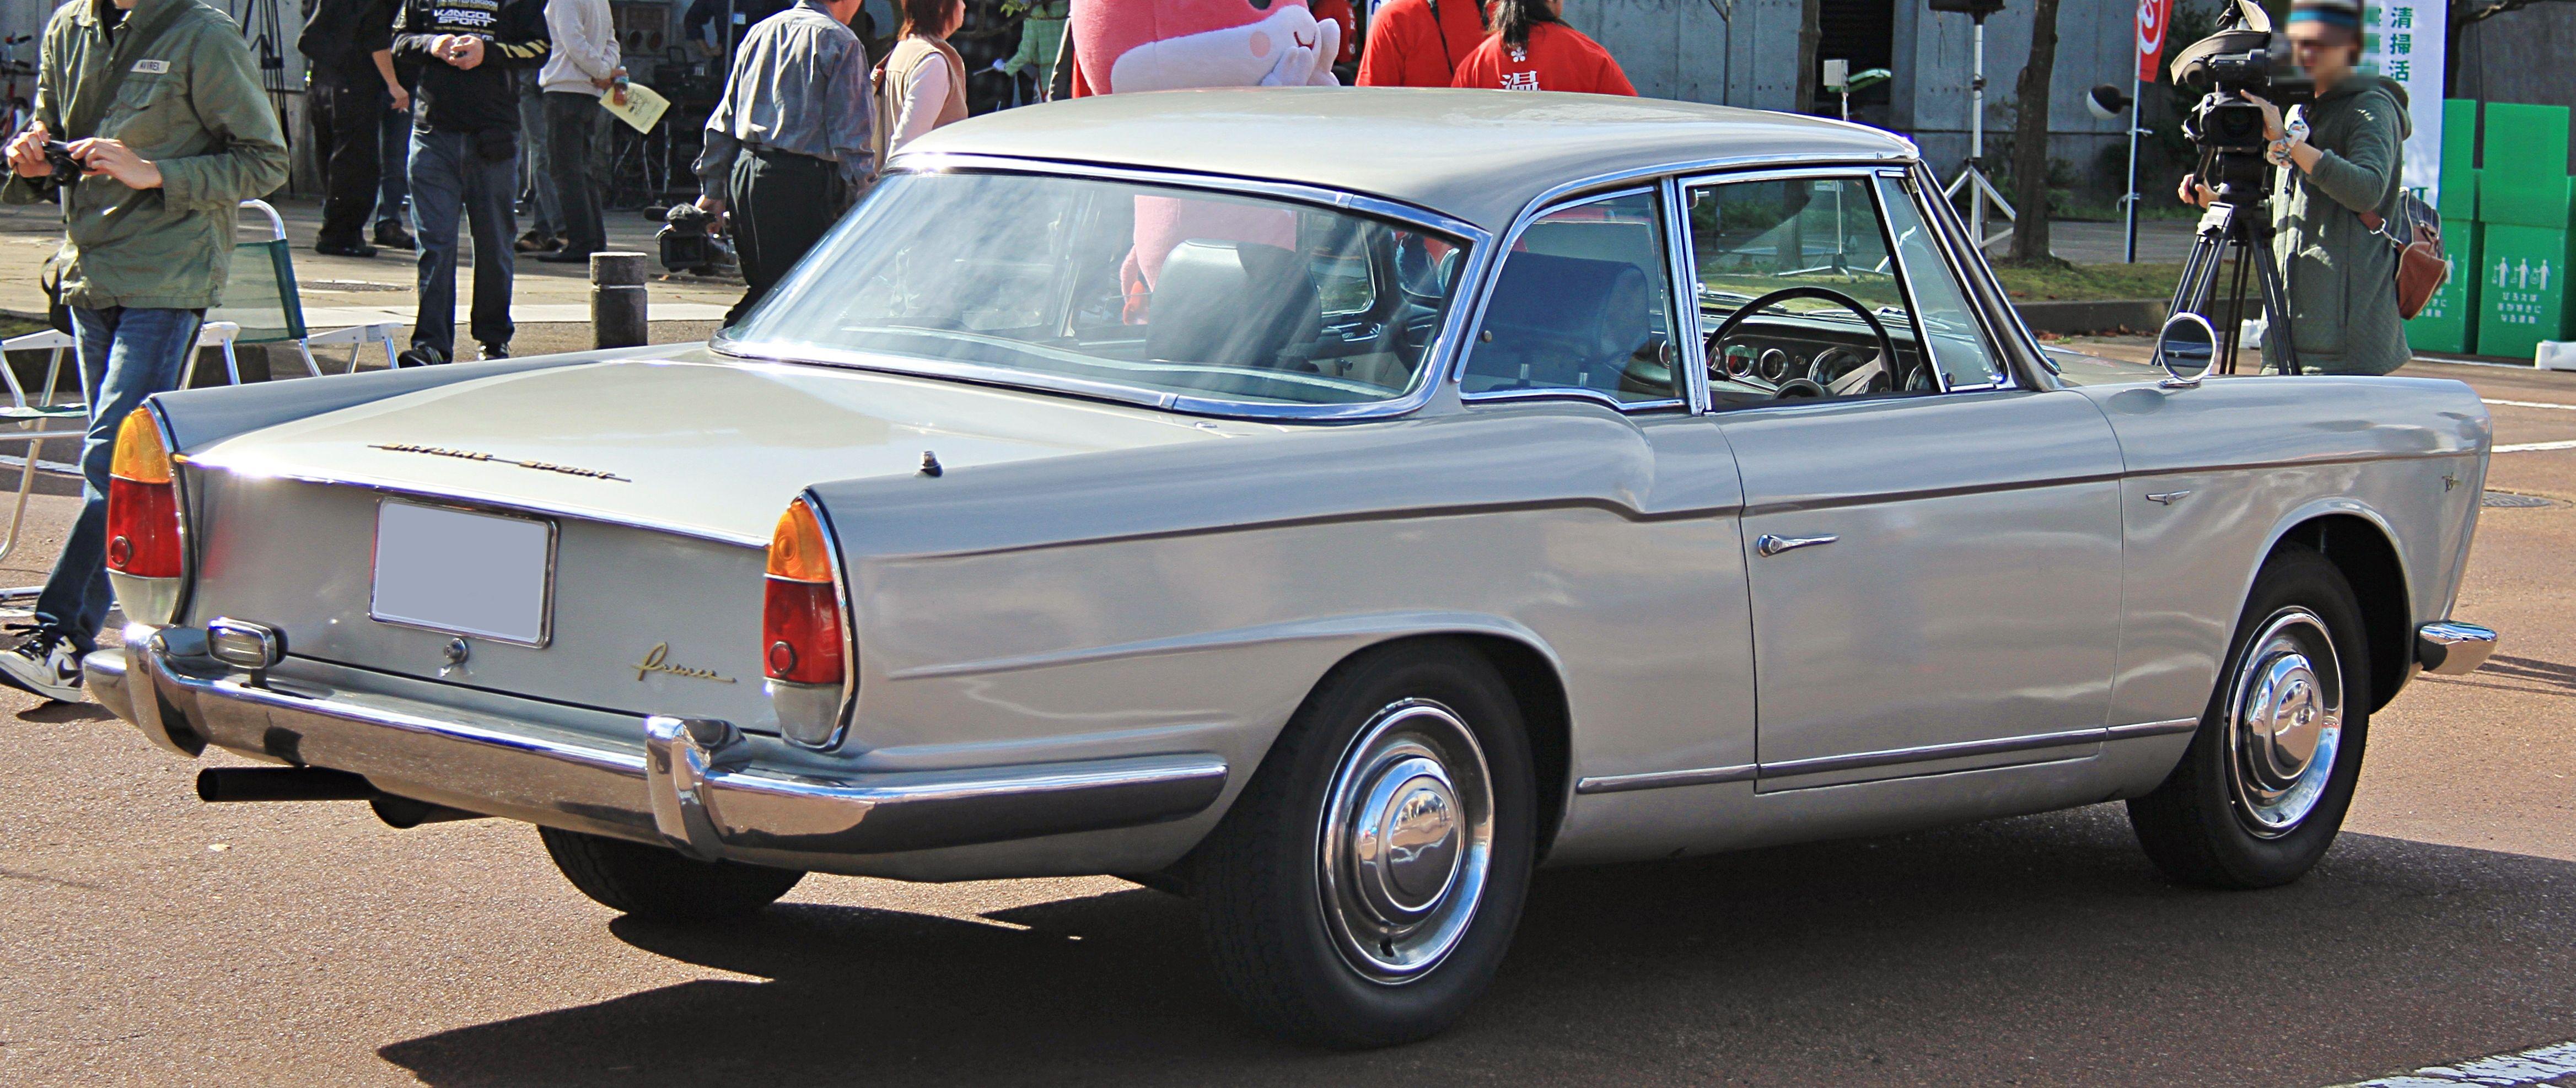 1962_Prince_Skyline_Sport_Coupe_rear.jpg